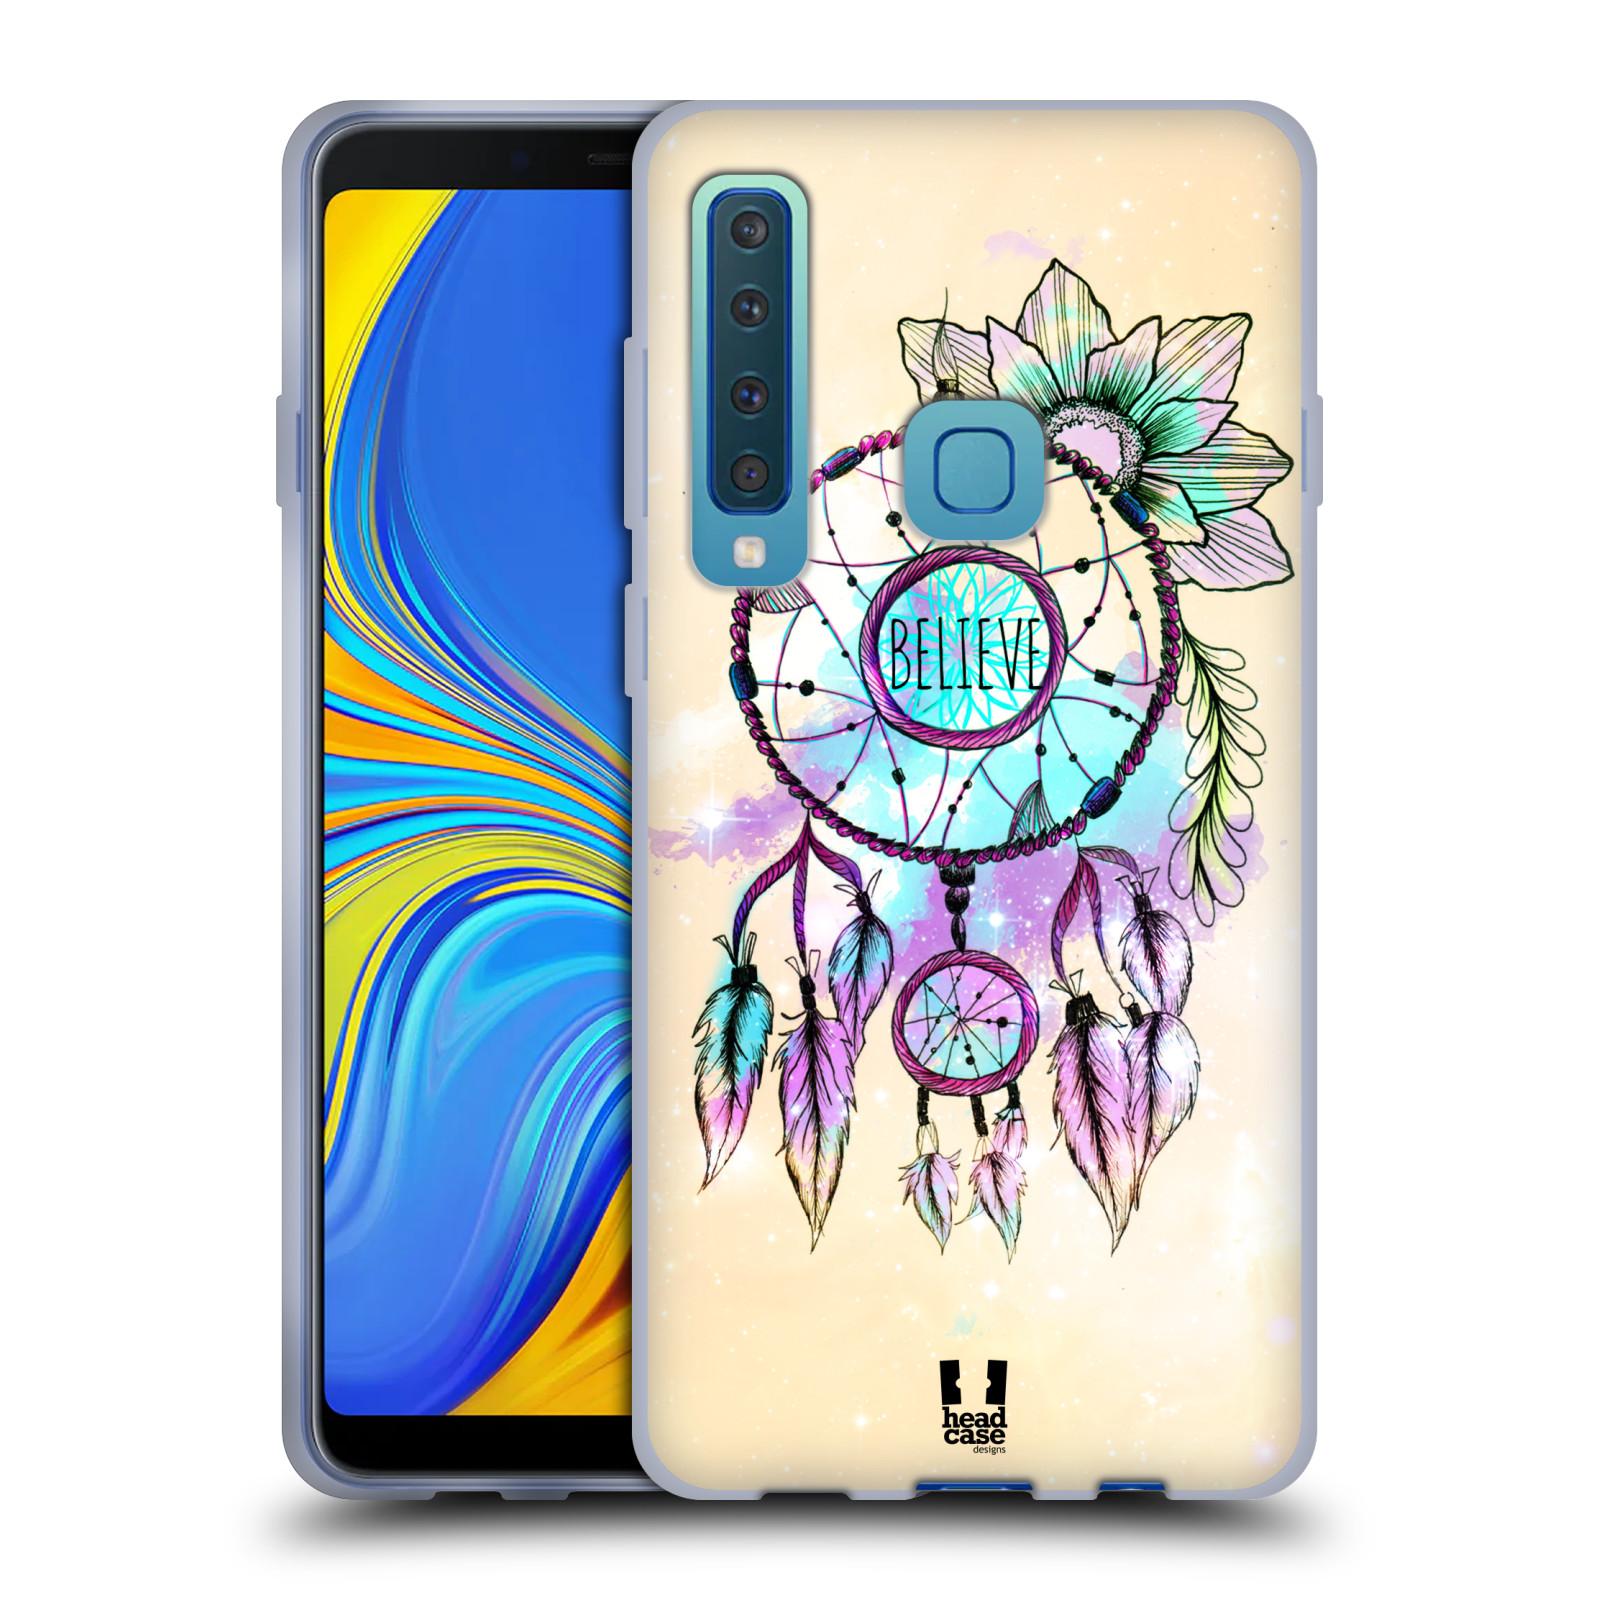 Silikonové pouzdro na mobil Samsung Galaxy A9 (2018) - Head Case - MIX BELIEVE